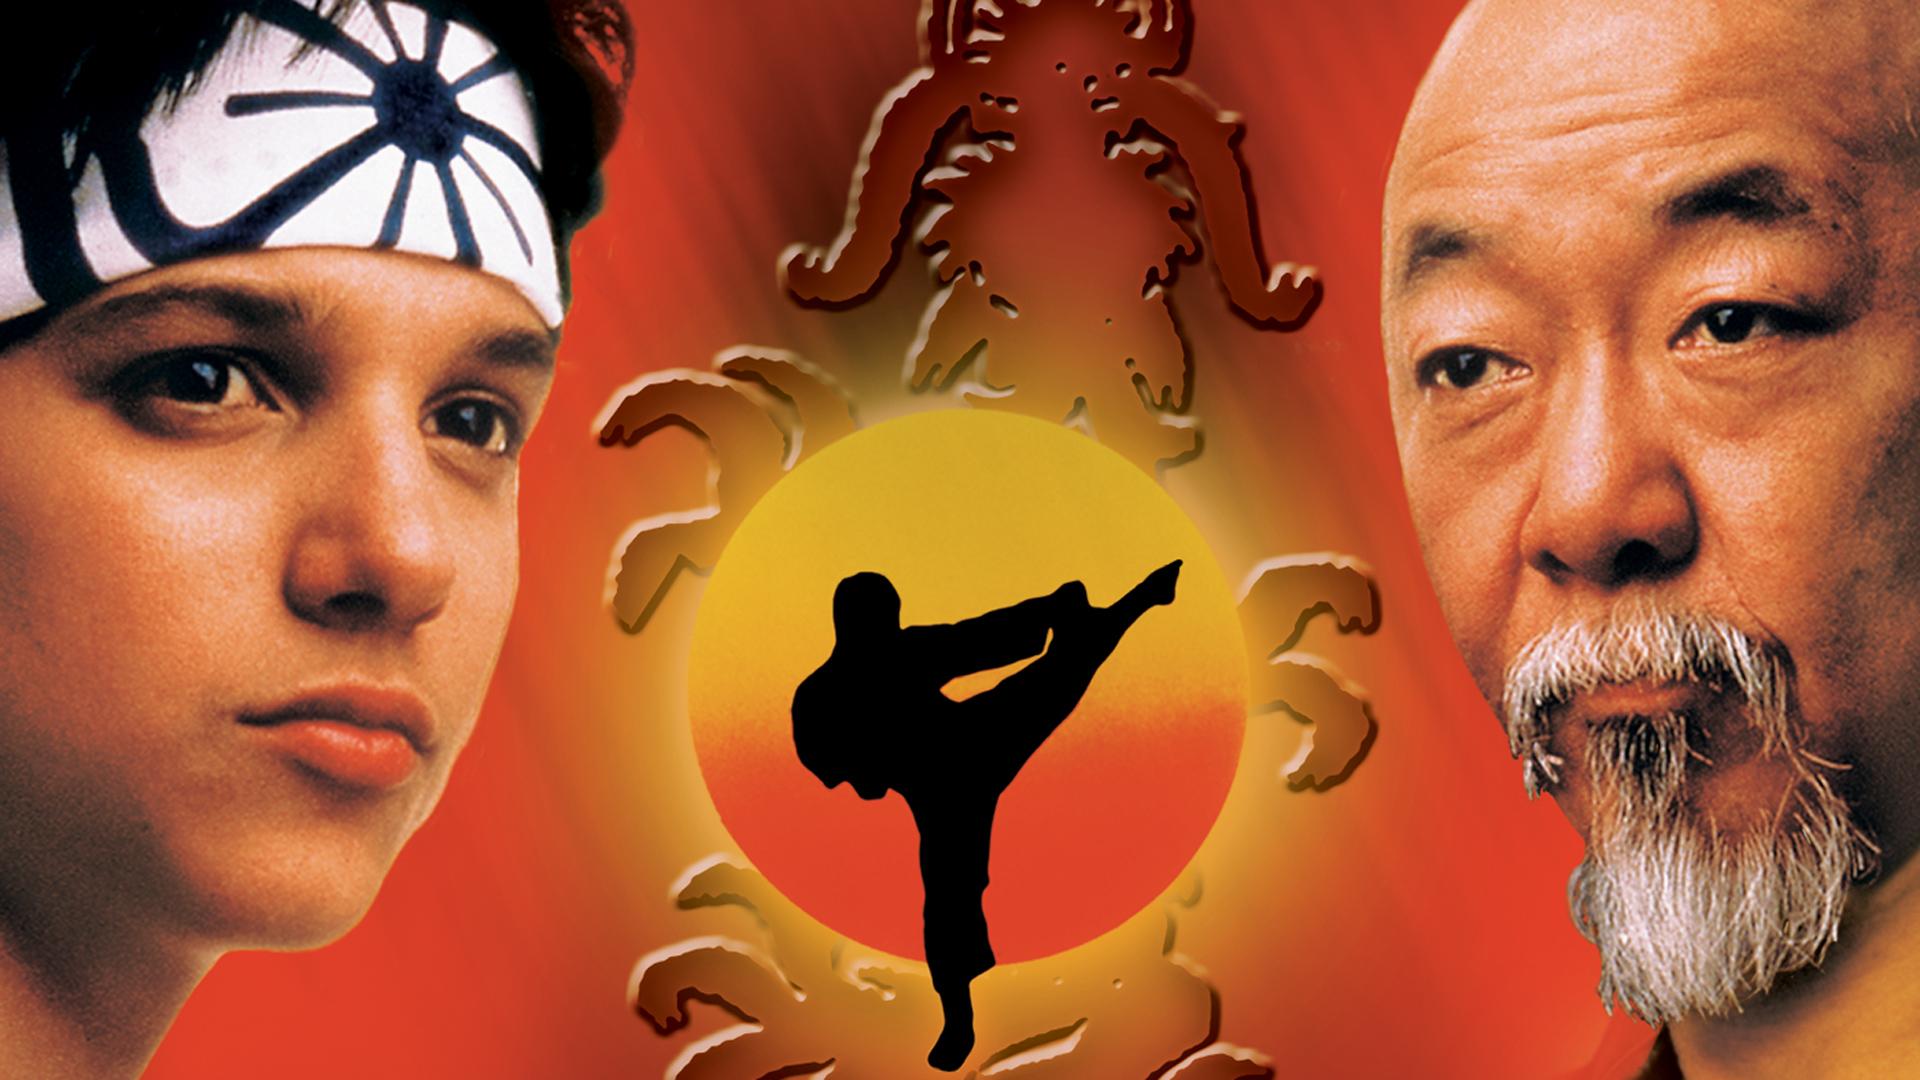 The Karate Kid Part II Skycom 1920x1080